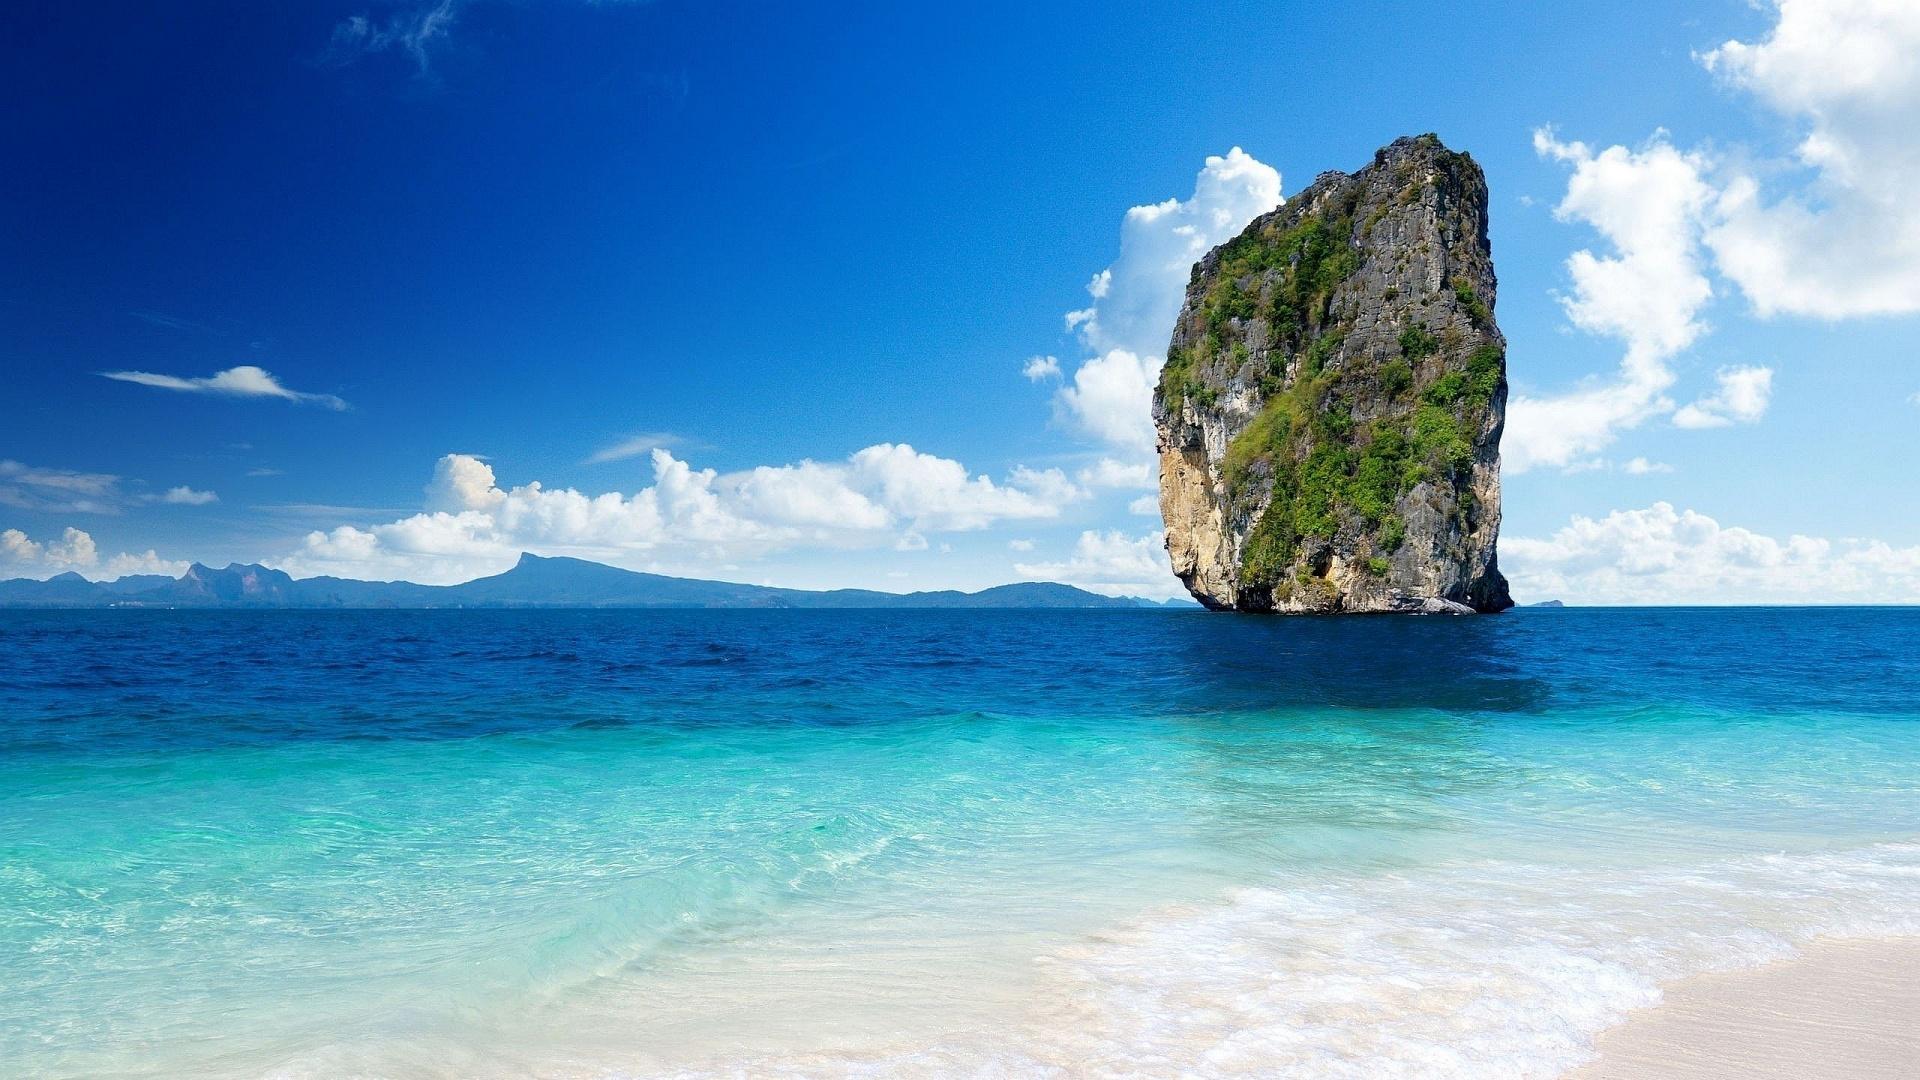 Sfondi mare paesaggi hd scoglio sfondi hd gratis for Sfondi desktop hd paesaggi